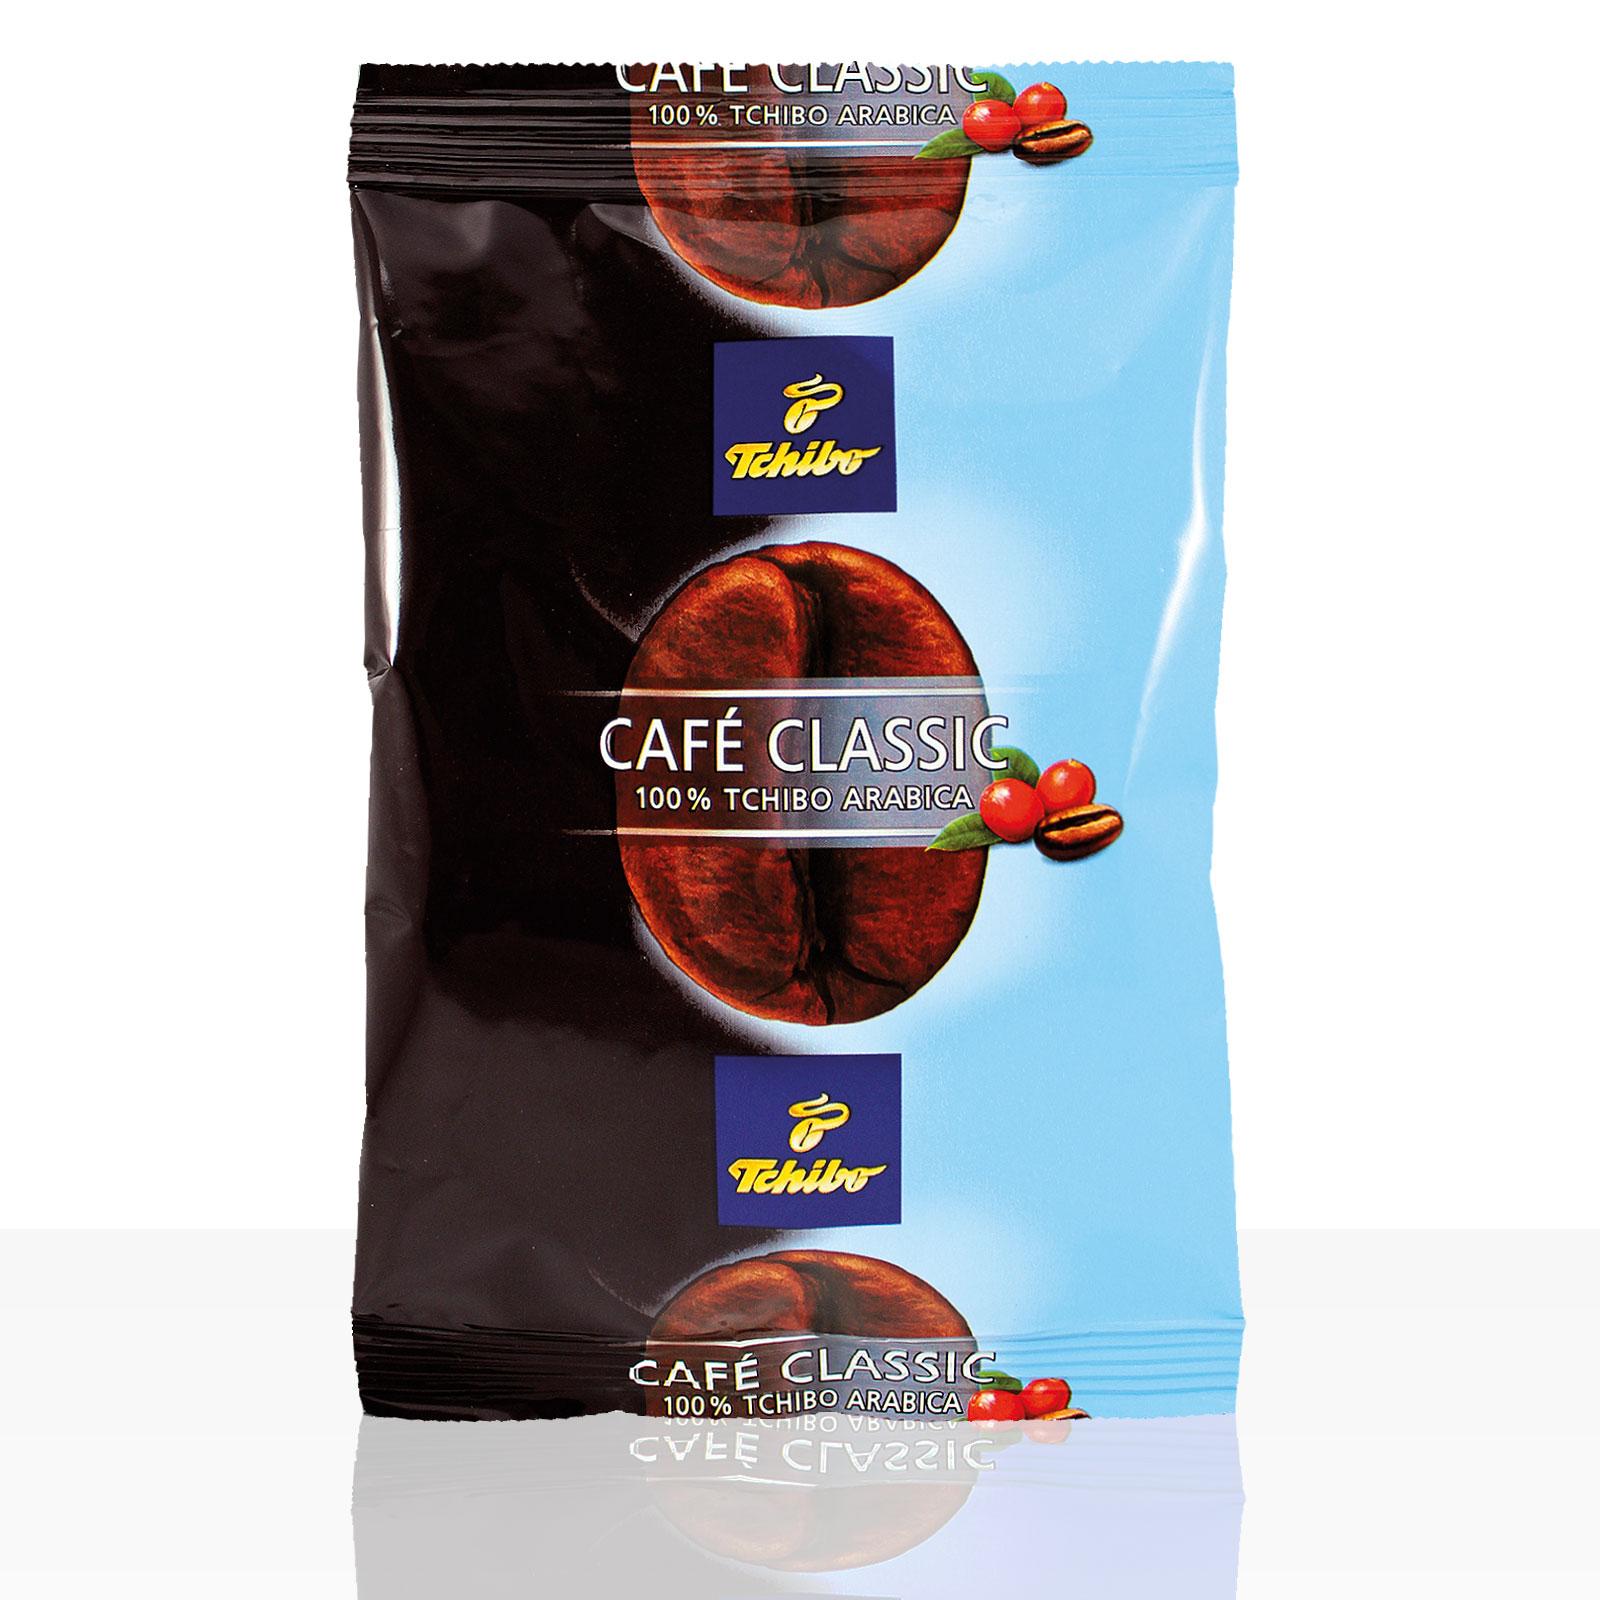 Tchibo Cafe Classic Mild HY - 72 x 70g Kaffee gemahlen, Filterkaffee, 100% Arabica